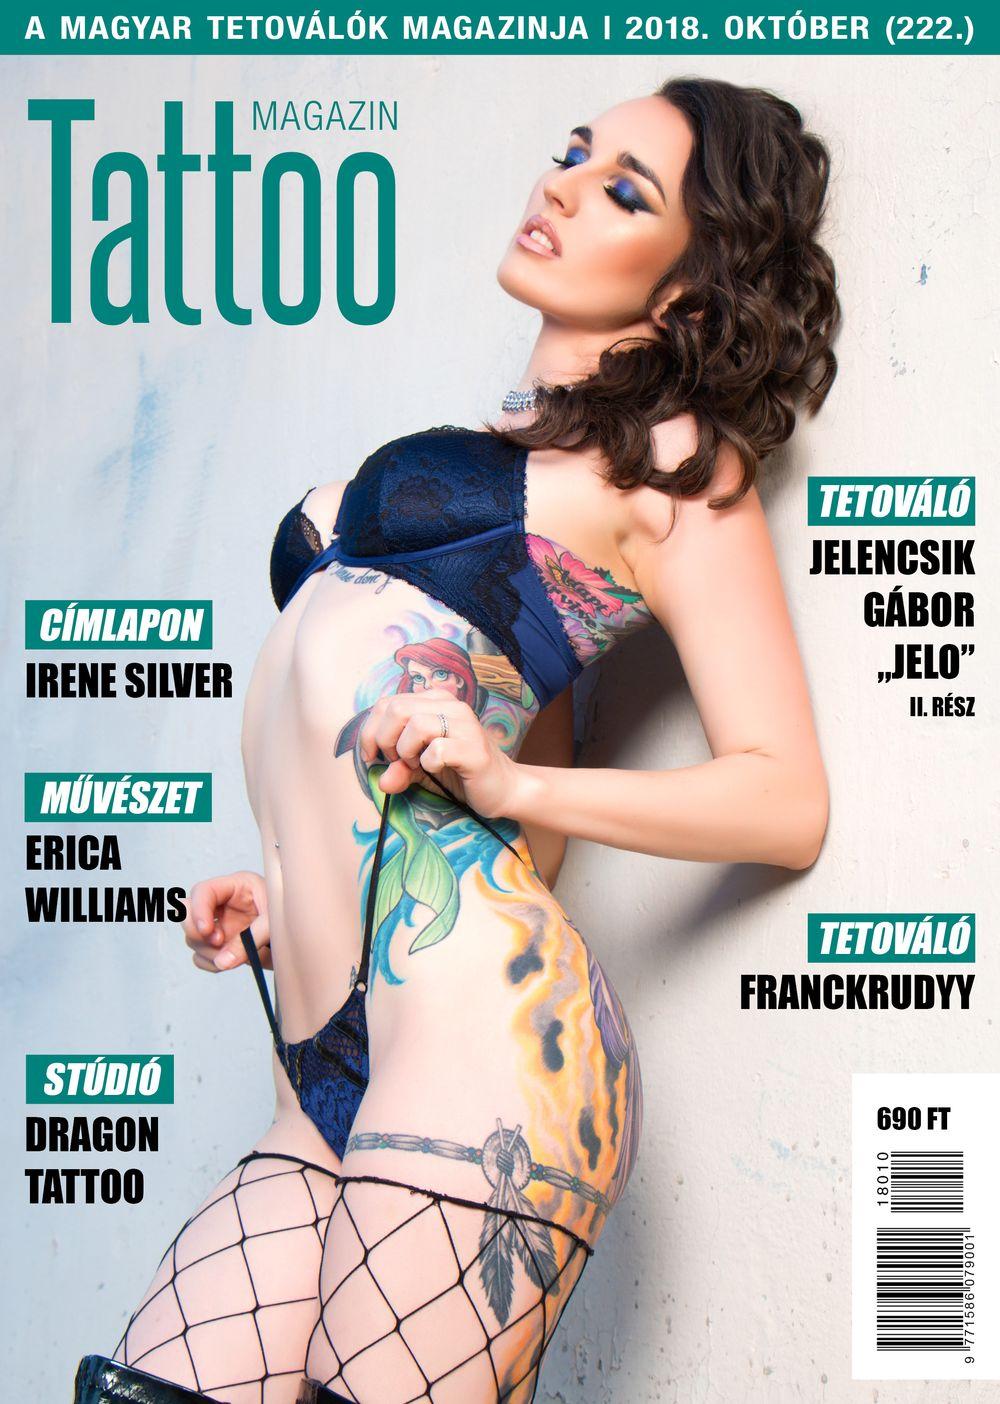 Tattoo 2018 Október (222.)